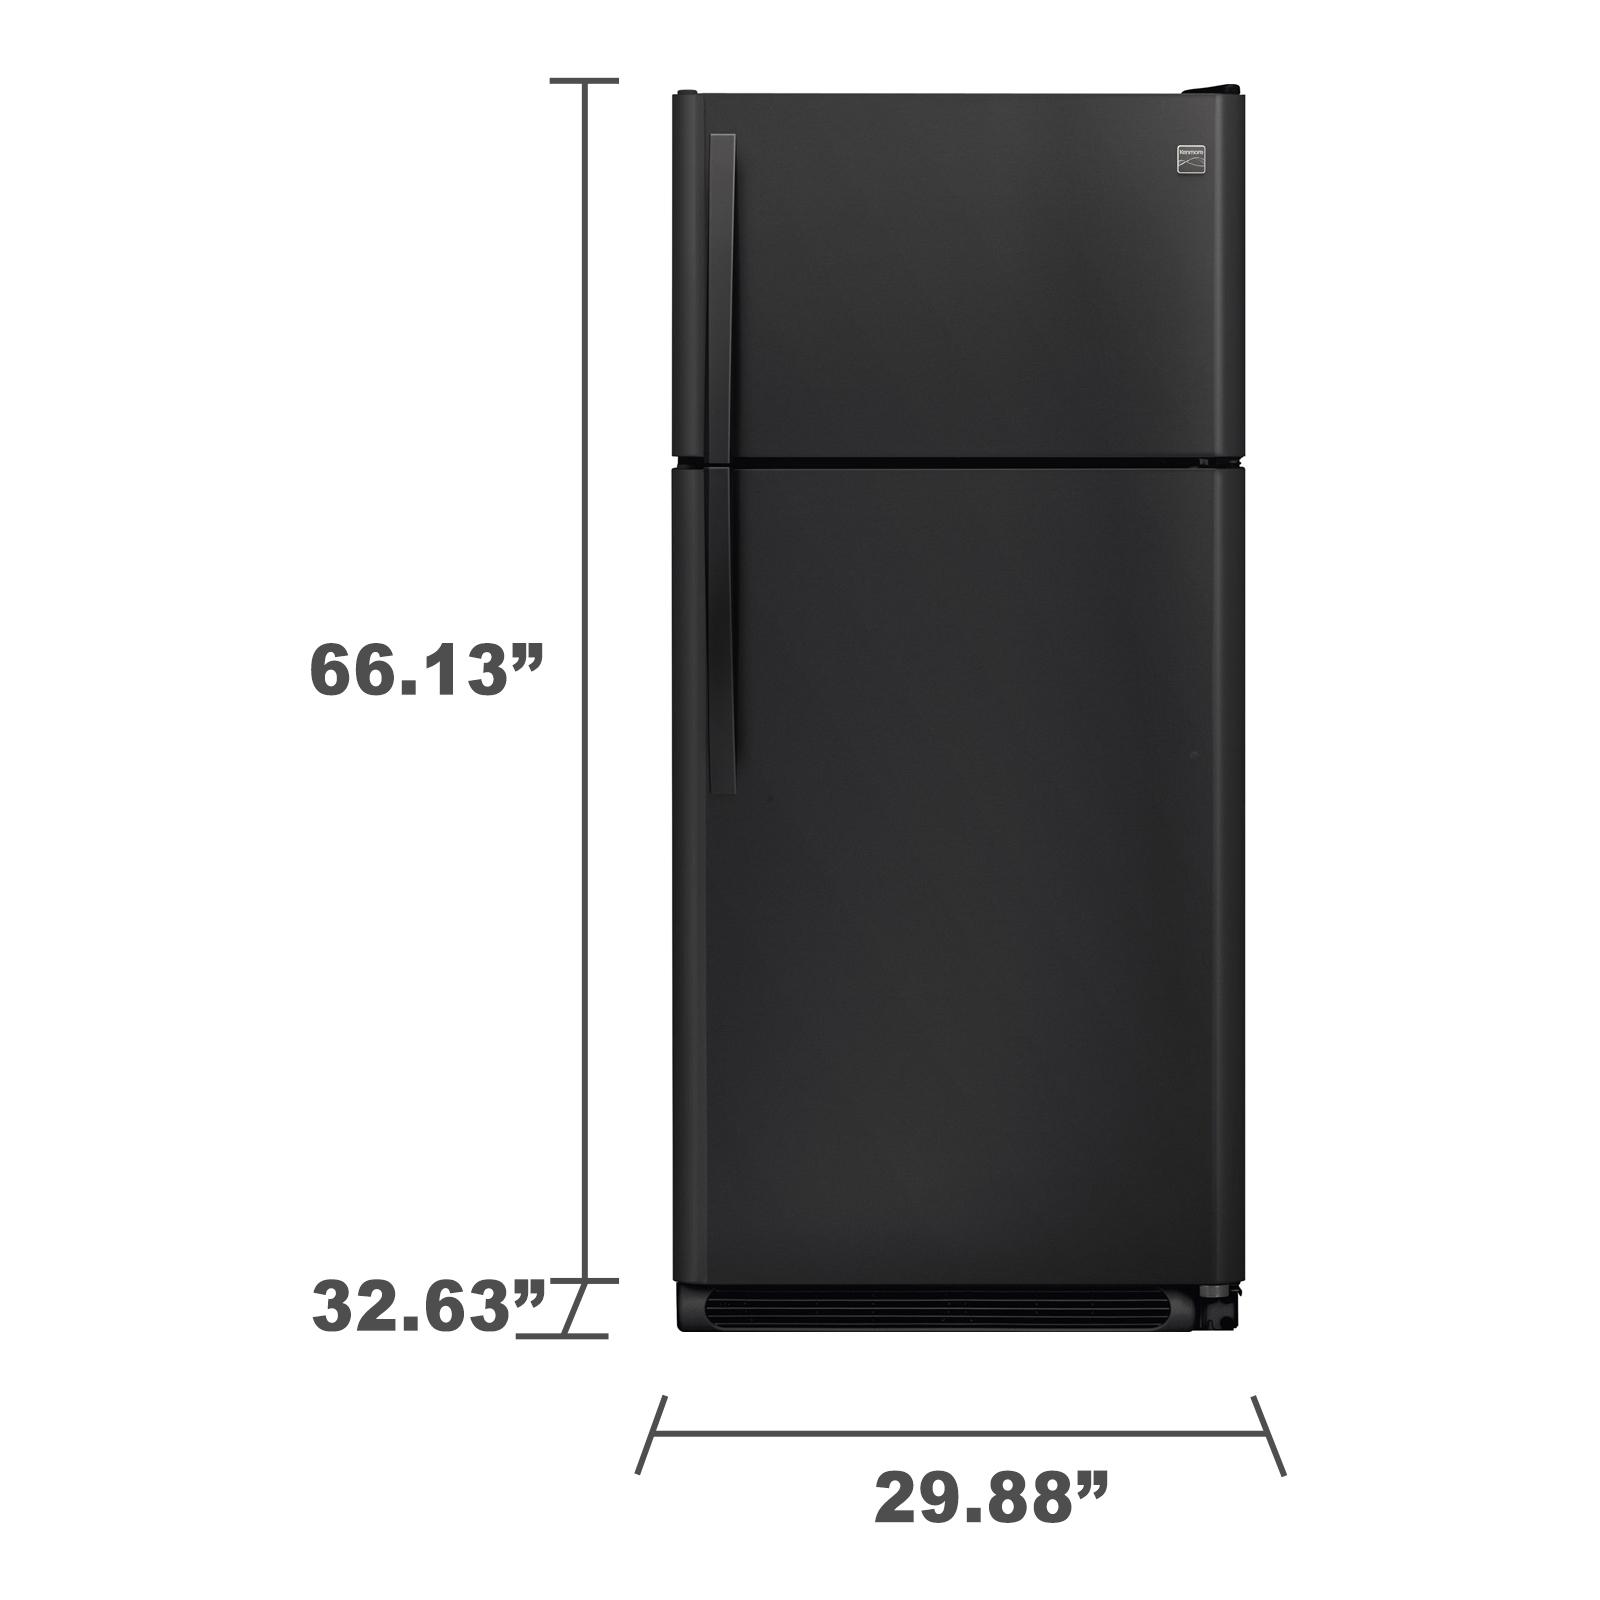 Kenmore 60609 18 cu. ft. Top Freezer Refrigerator - Black